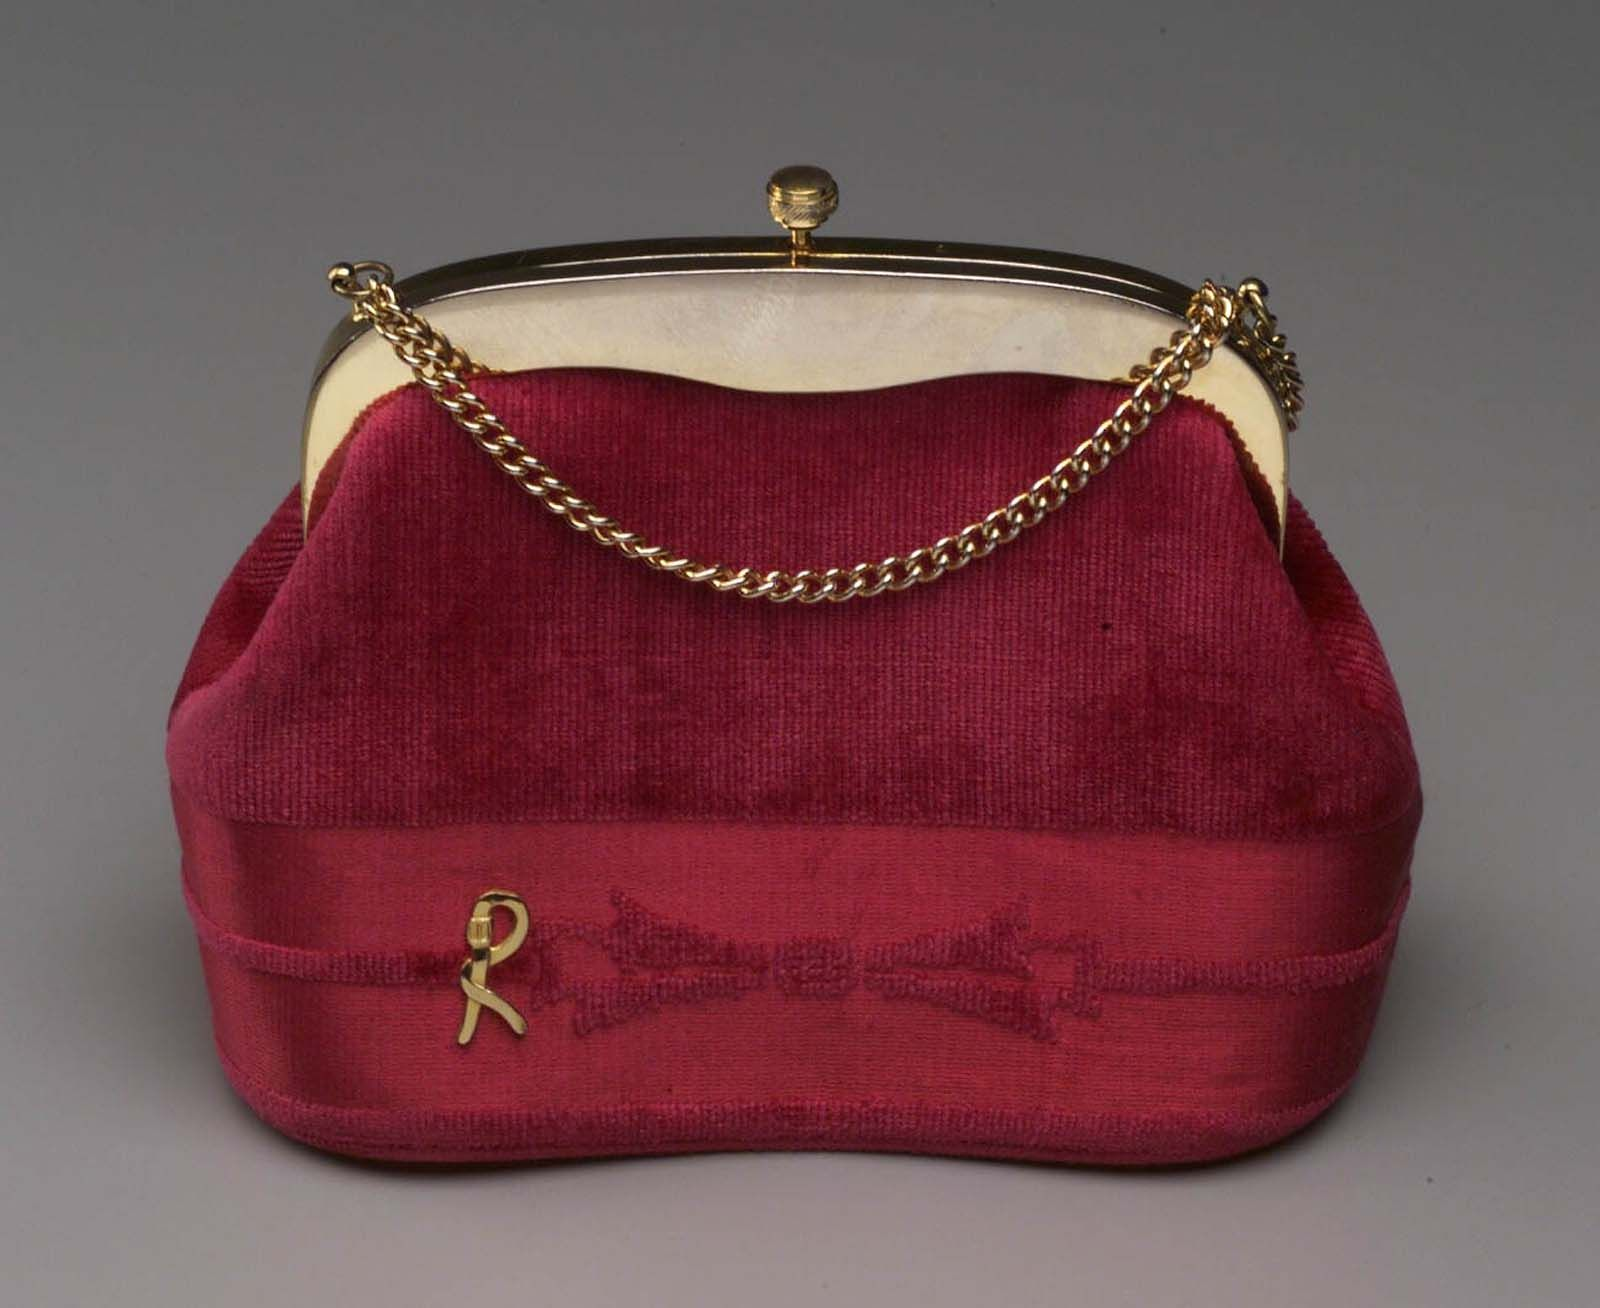 "cca9a7c657dd Roberta di Camerino Handbag - Italian 1950s ""Binocular case"" shaped small  handbag in hot pink velvet with band and bow pattern. Gold ""R"